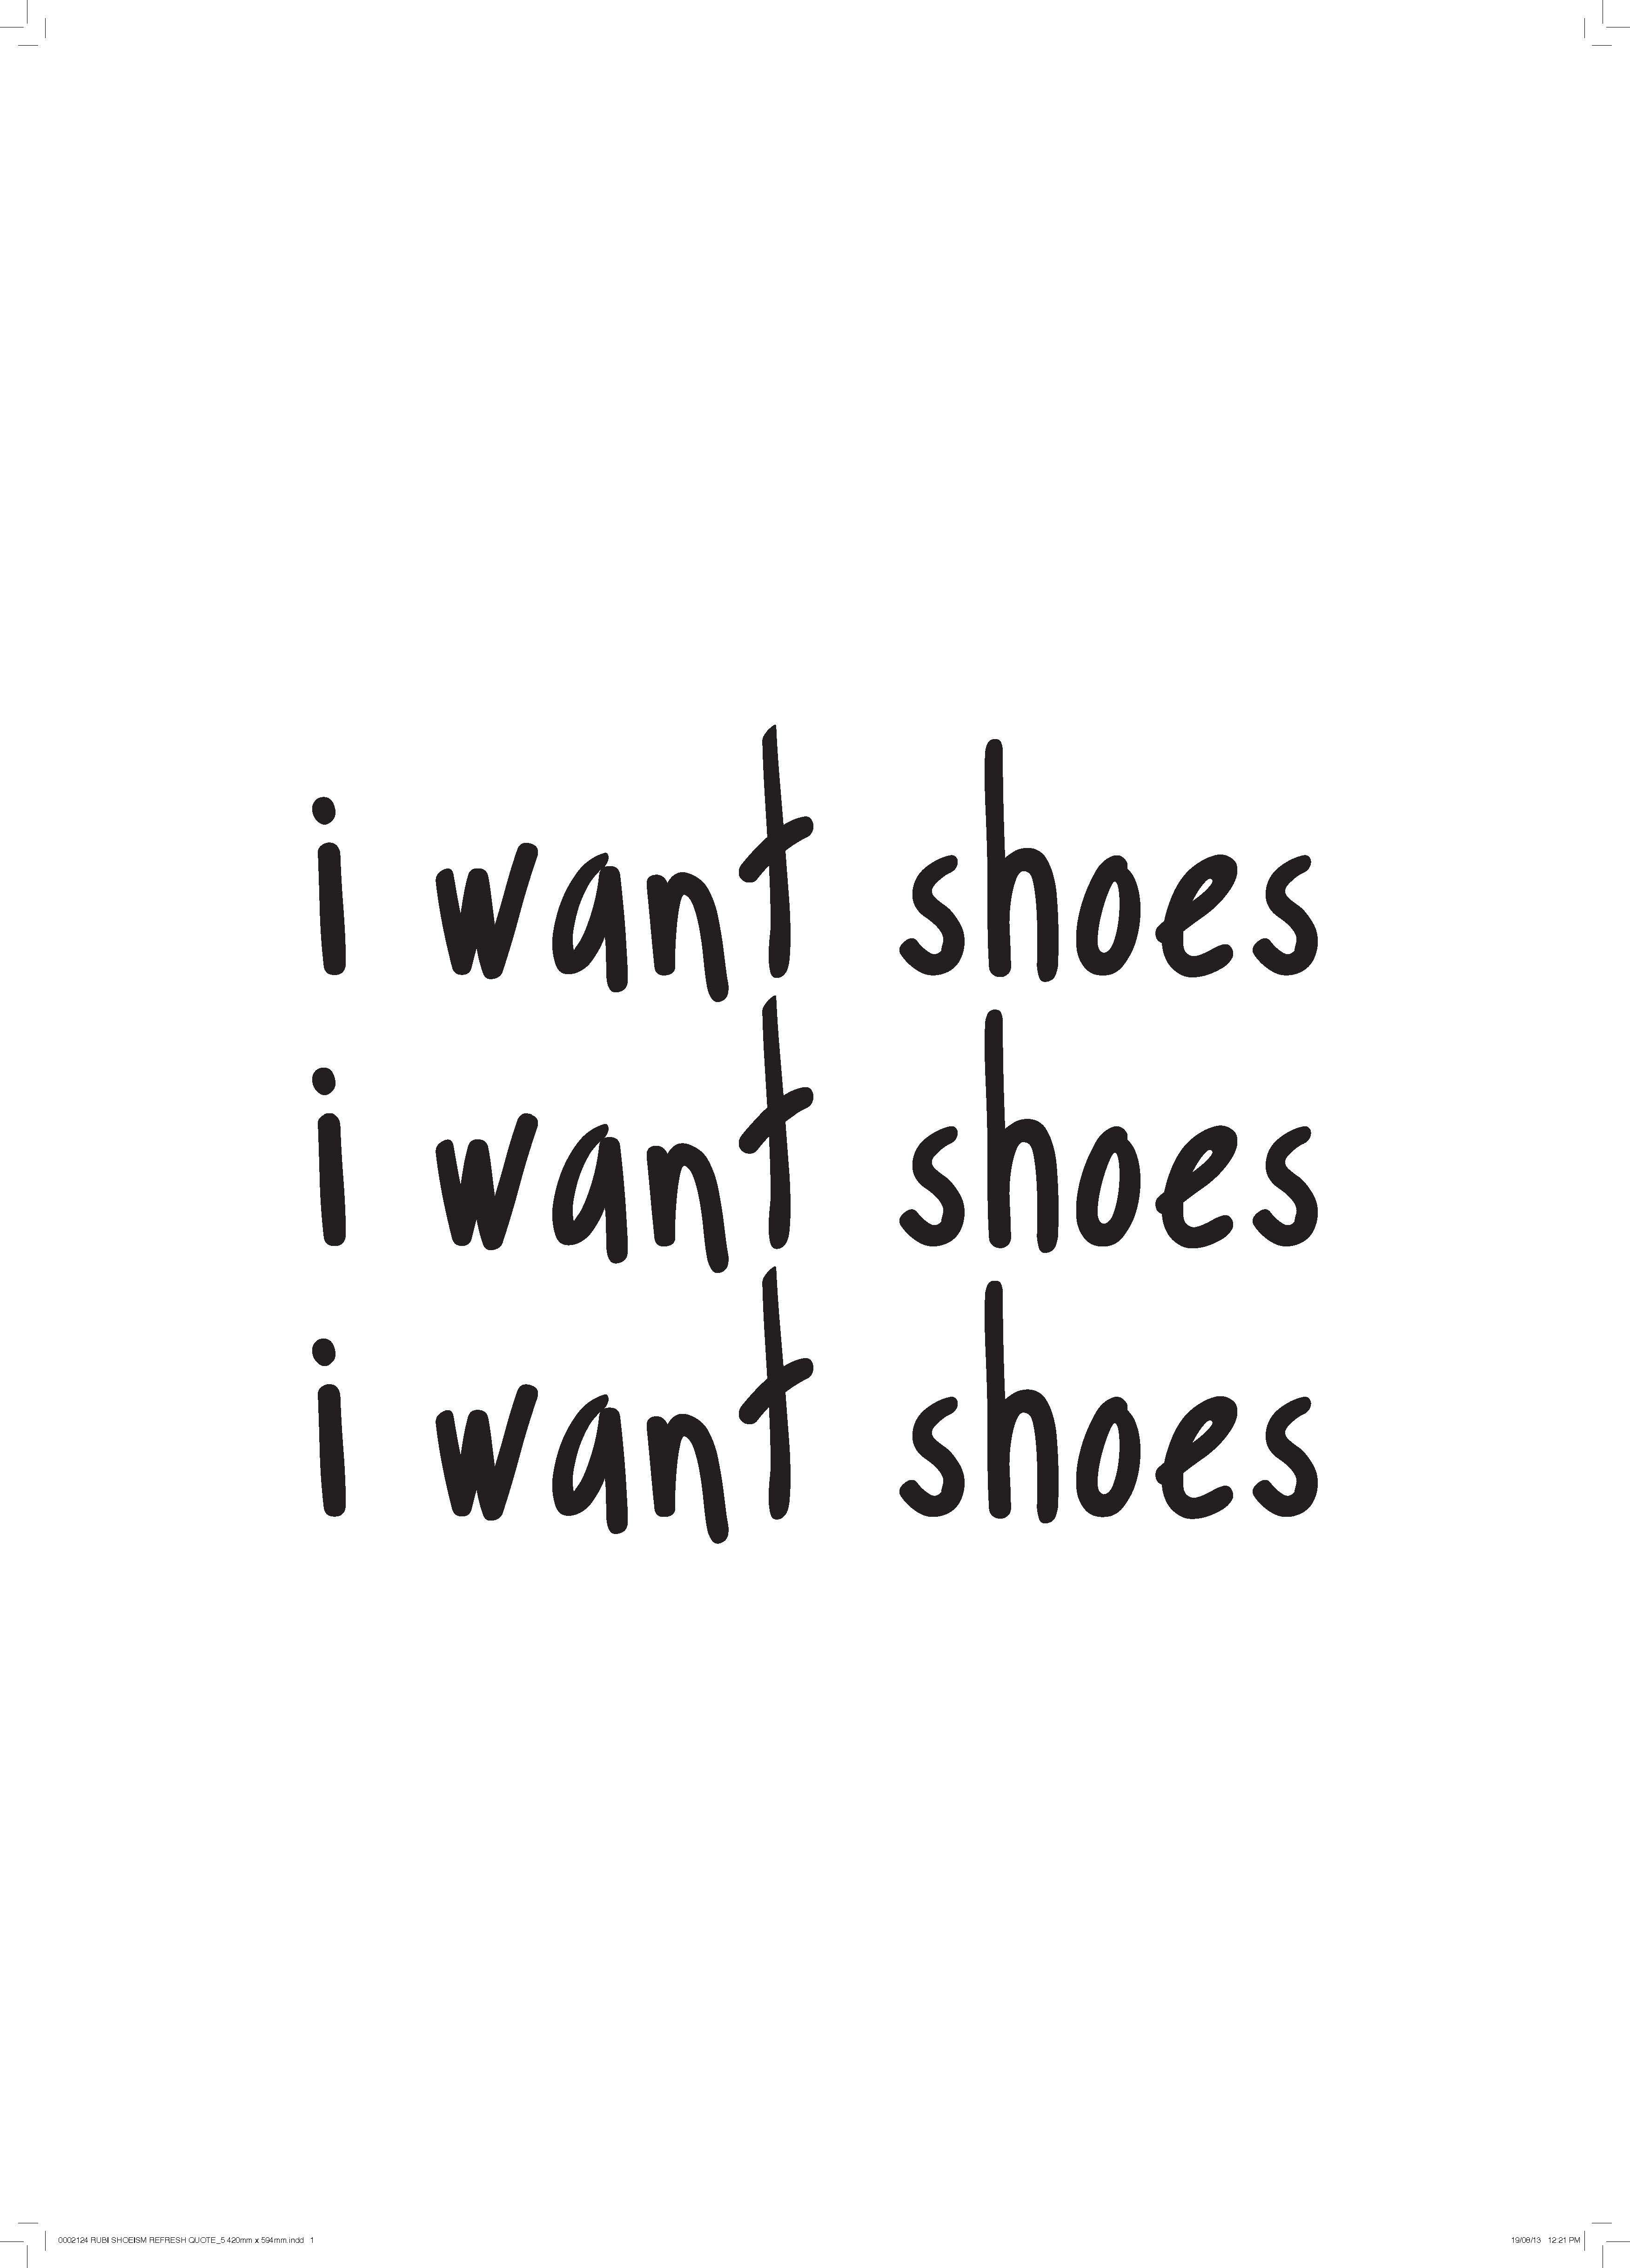 Shoe Quotes Frases Sobre Zapatos Tiendas Online De Zapatos